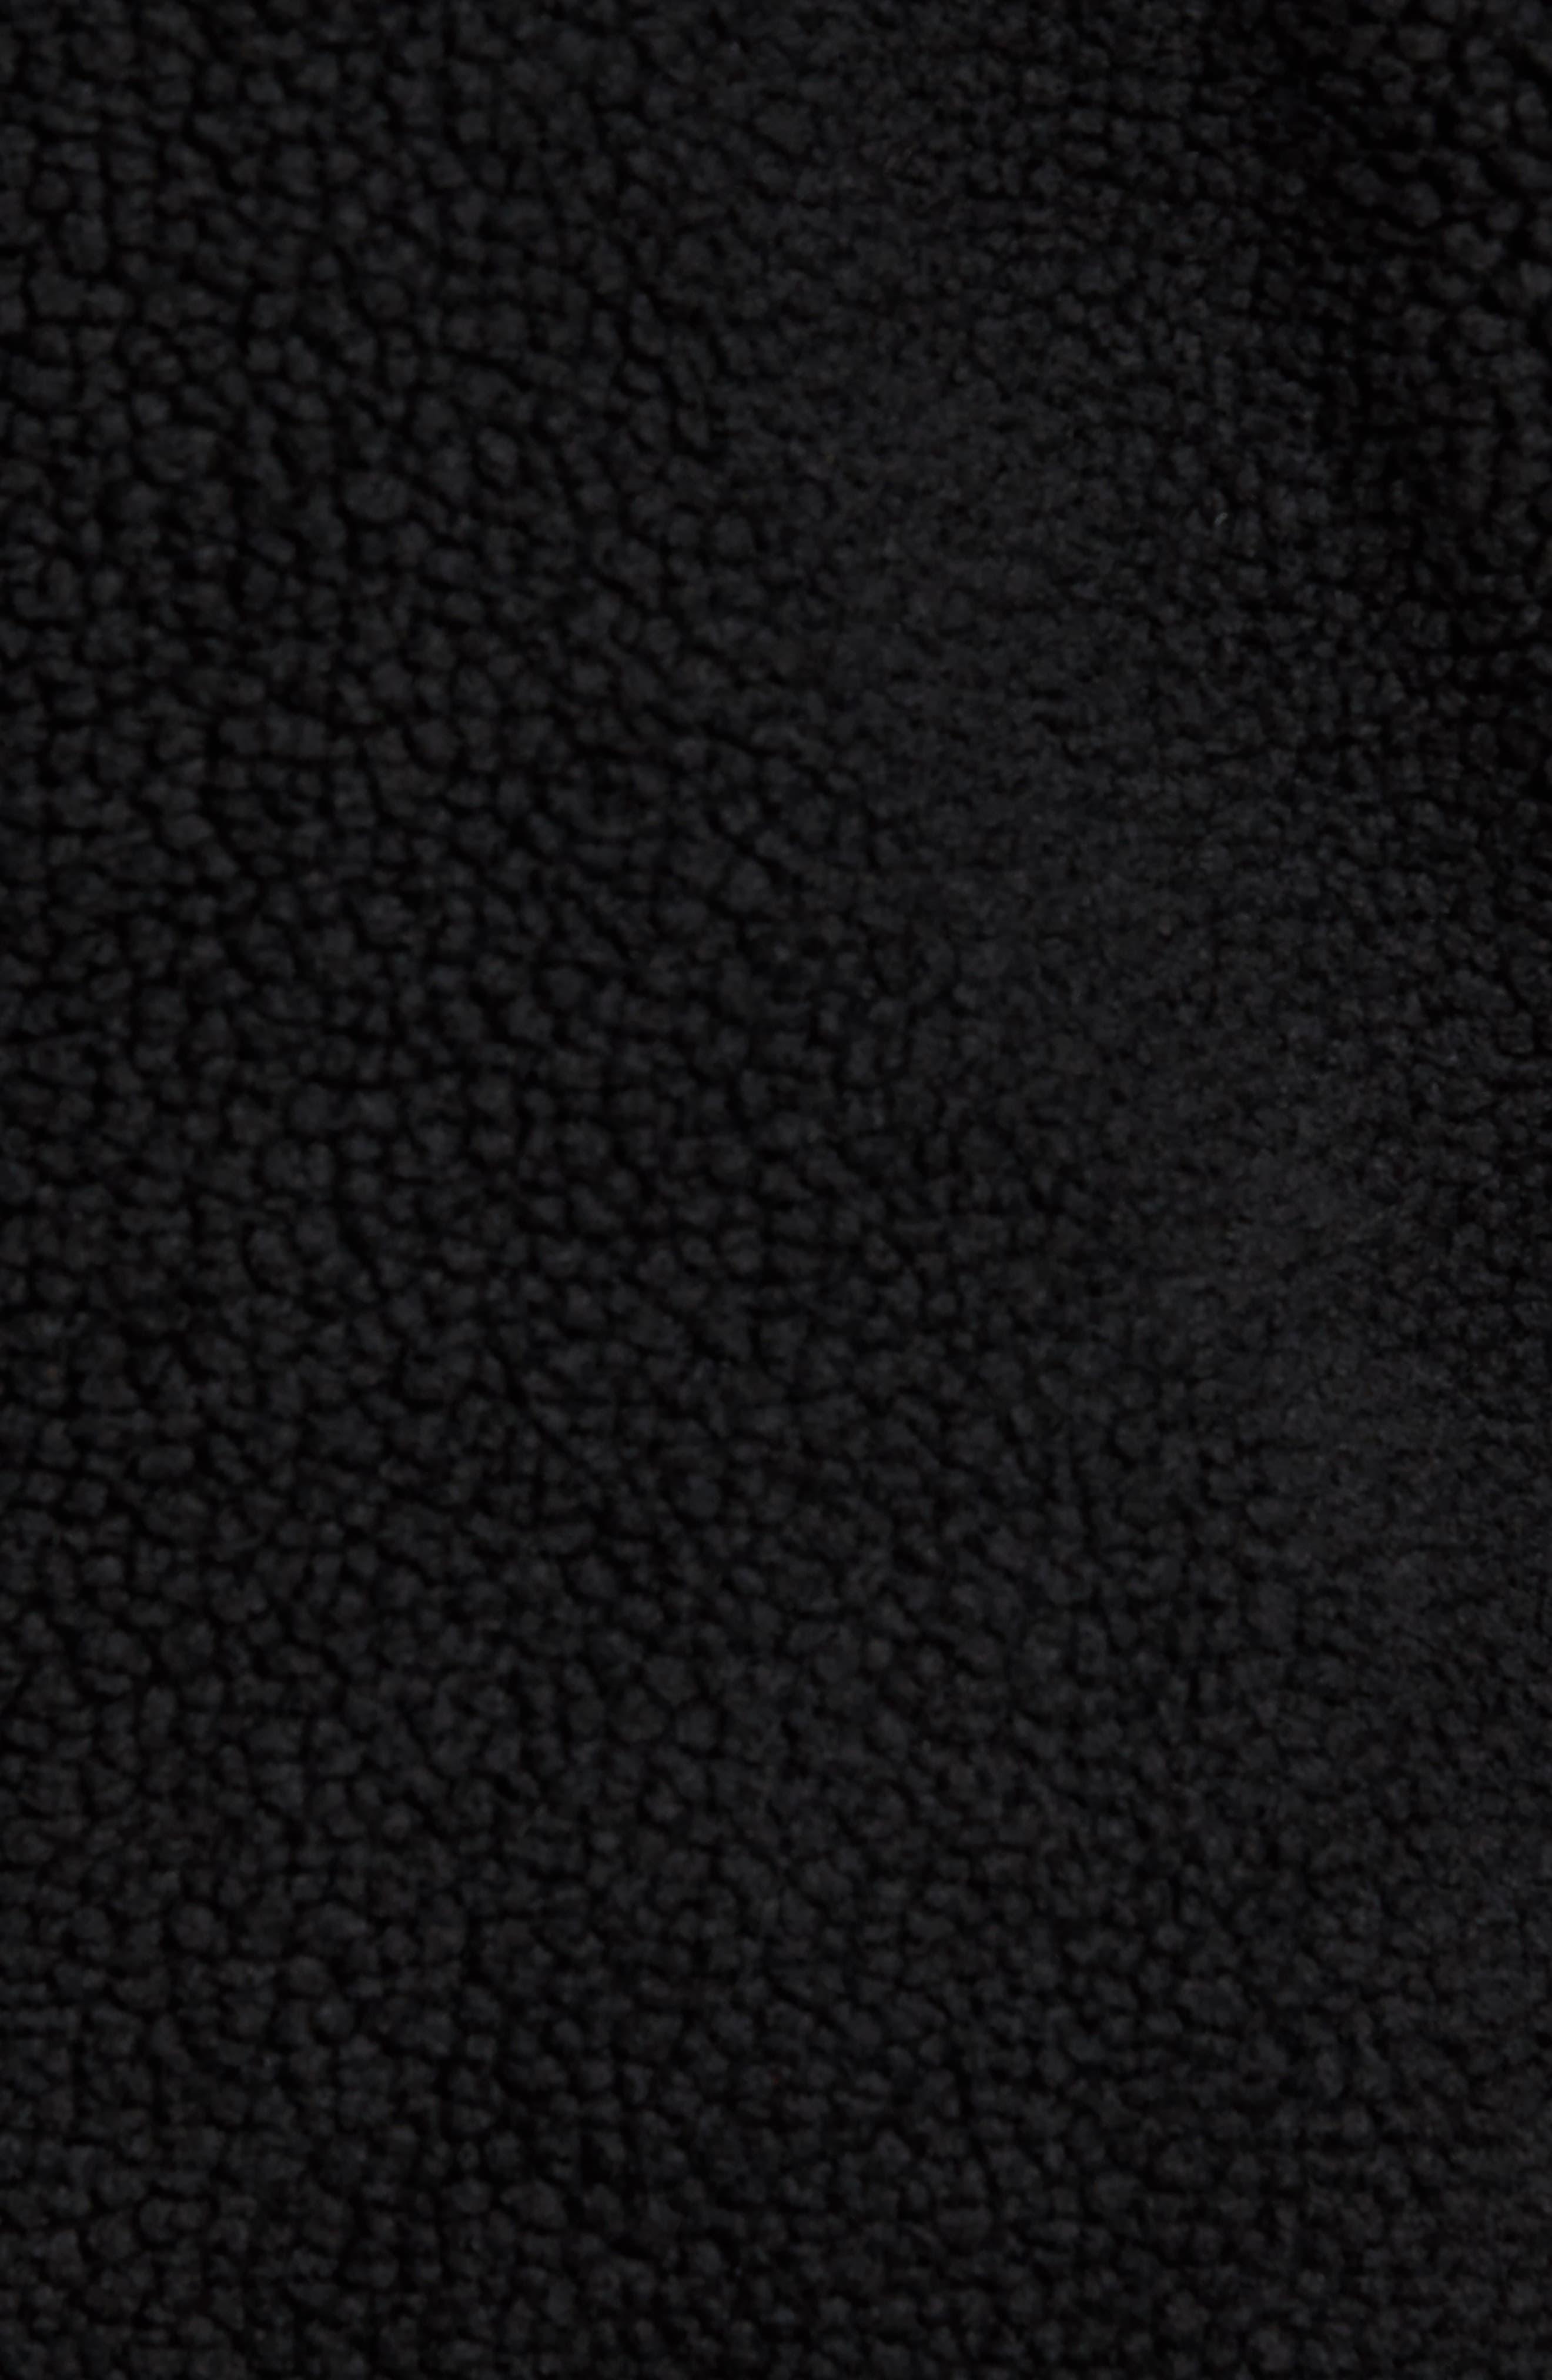 Retro-X Fleece Jacket,                             Alternate thumbnail 6, color,                             002